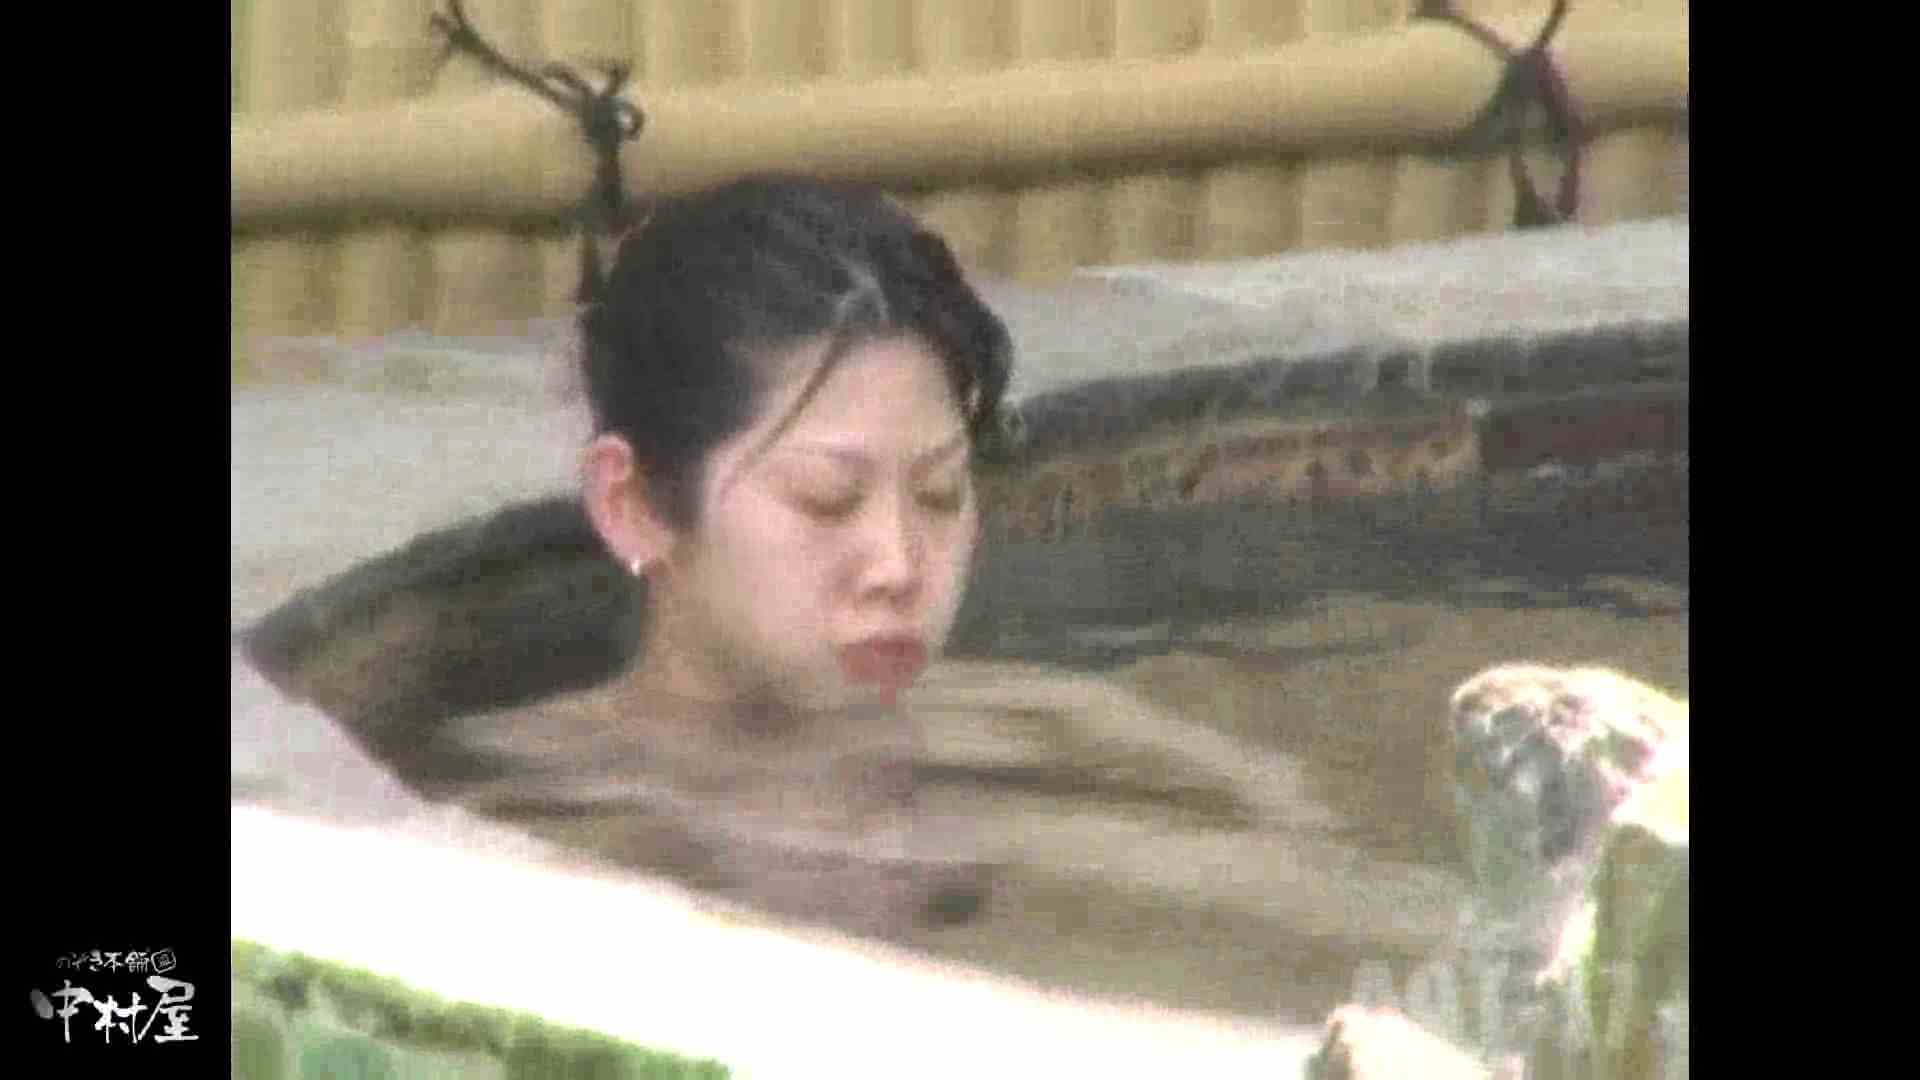 Aquaな露天風呂Vol.881潜入盗撮露天風呂十七判湯 其の三 盗撮 AV動画キャプチャ 72画像 66